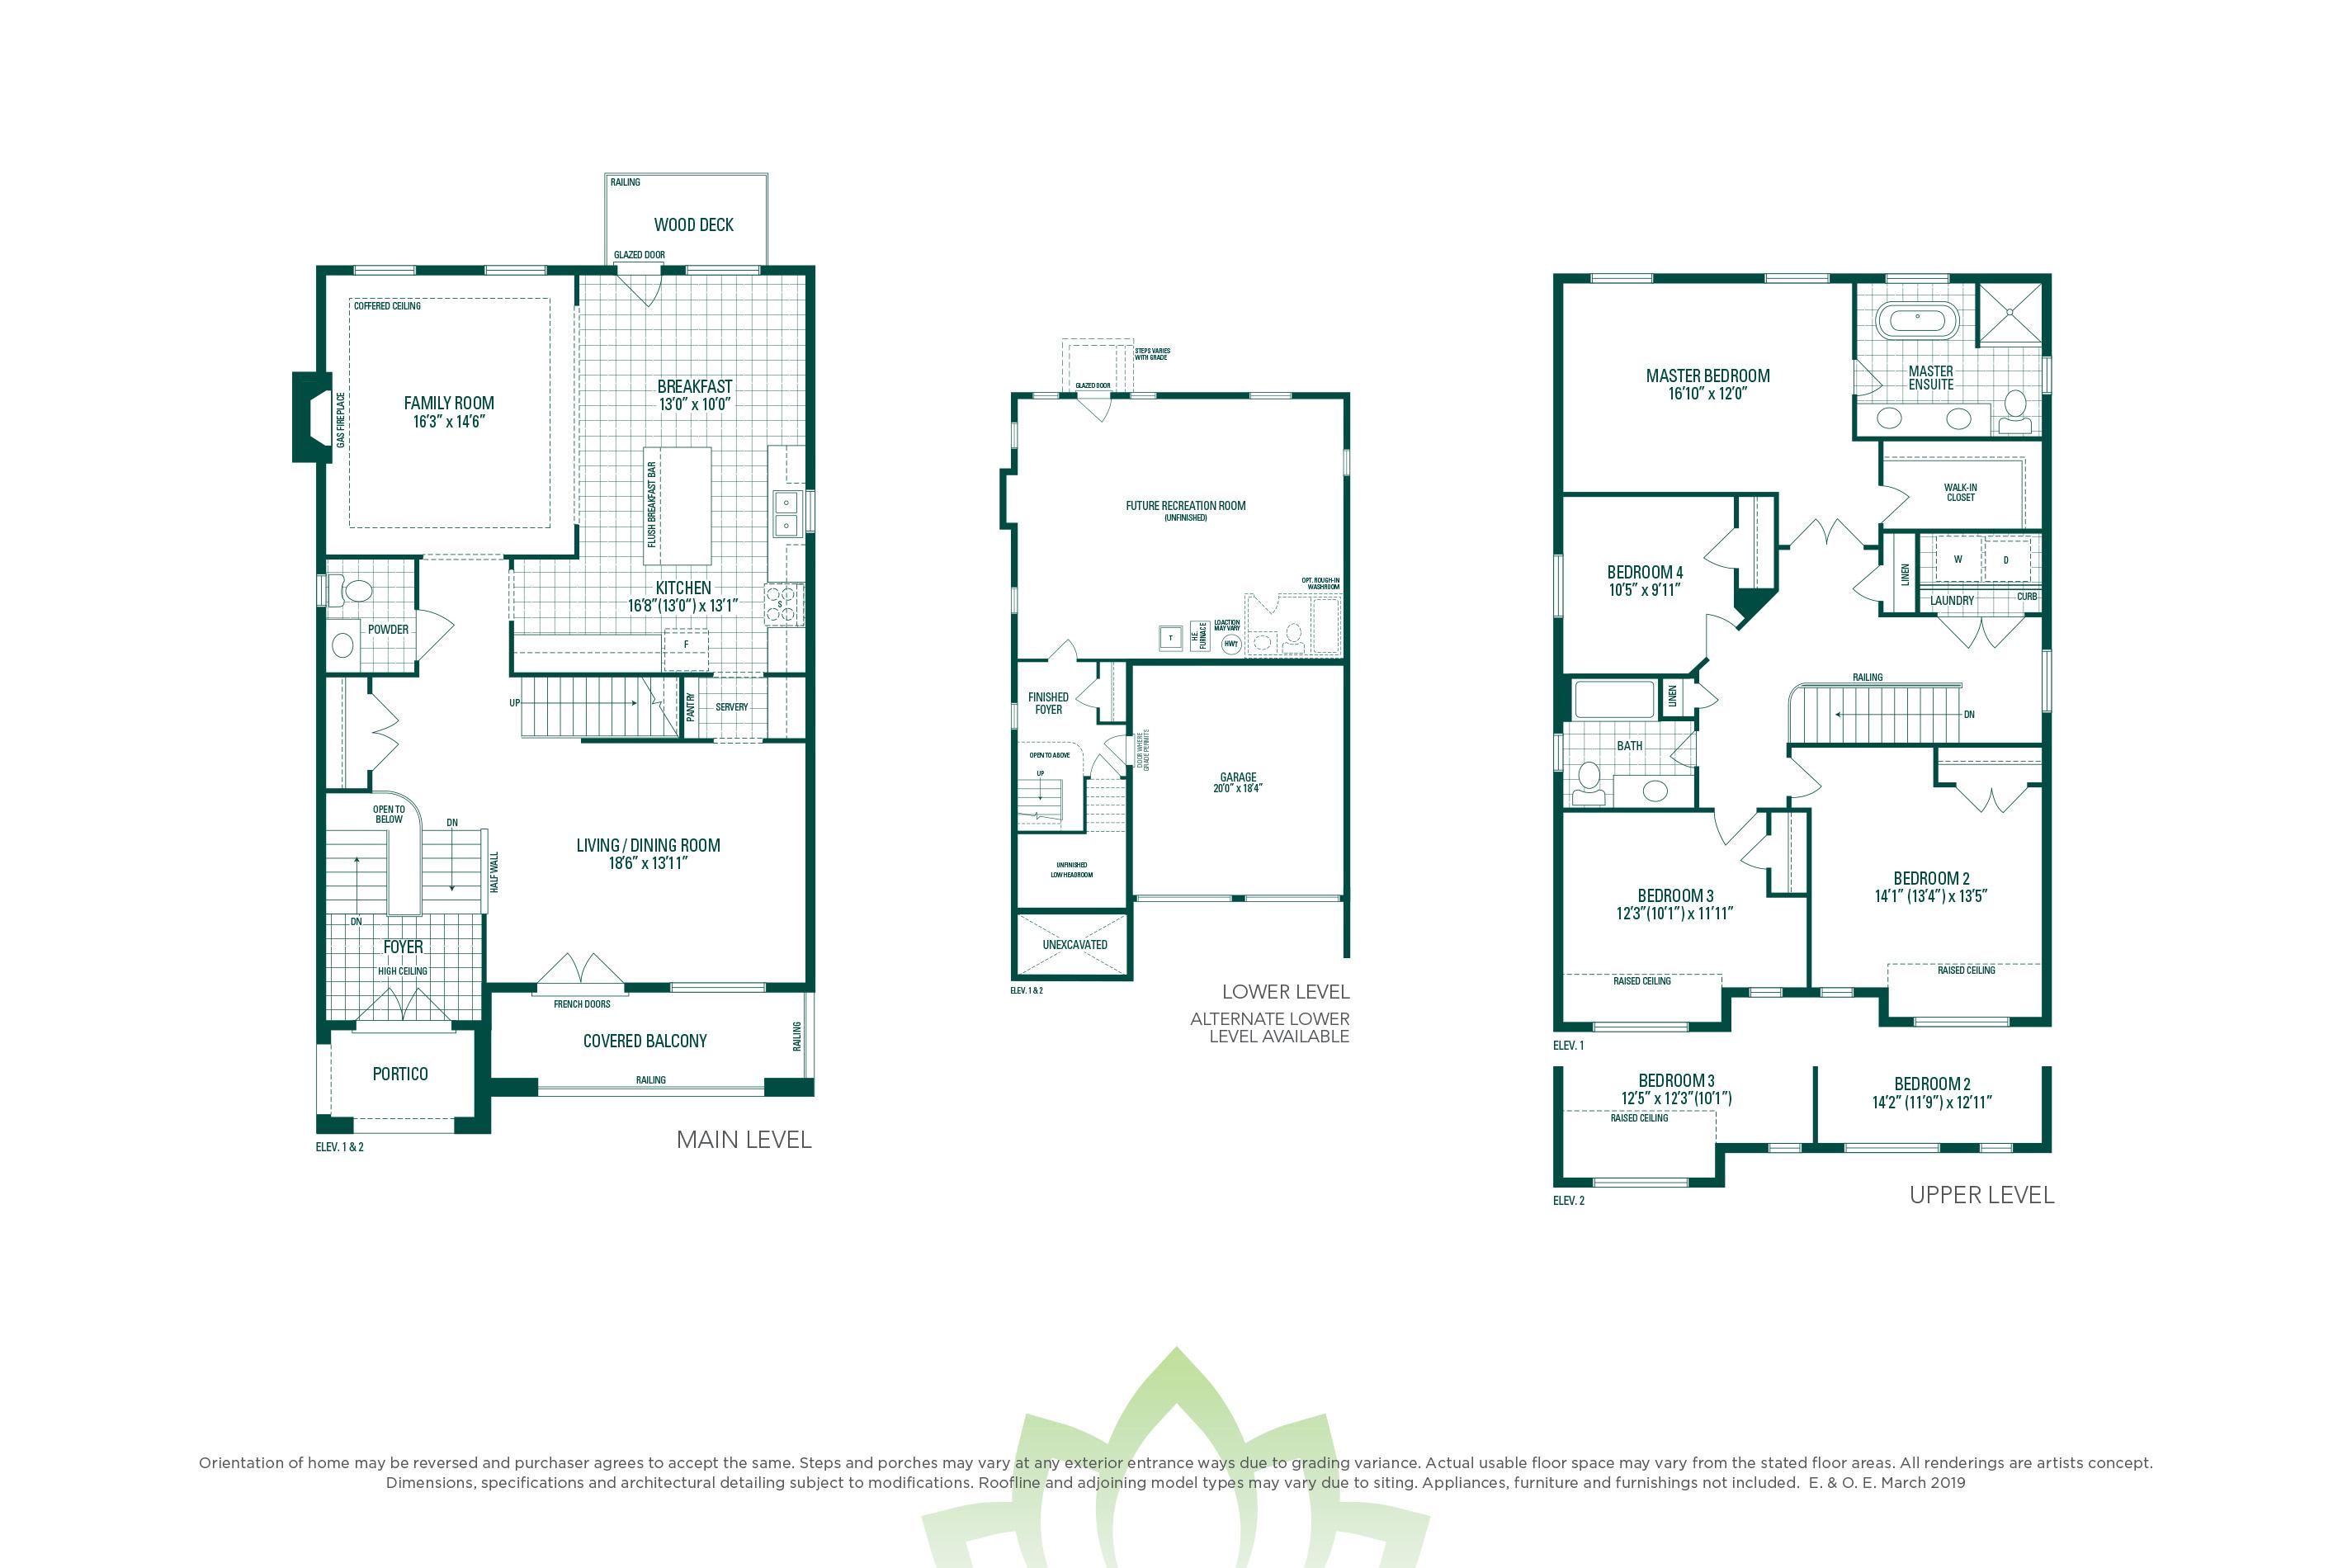 Preston 5 Floorplan